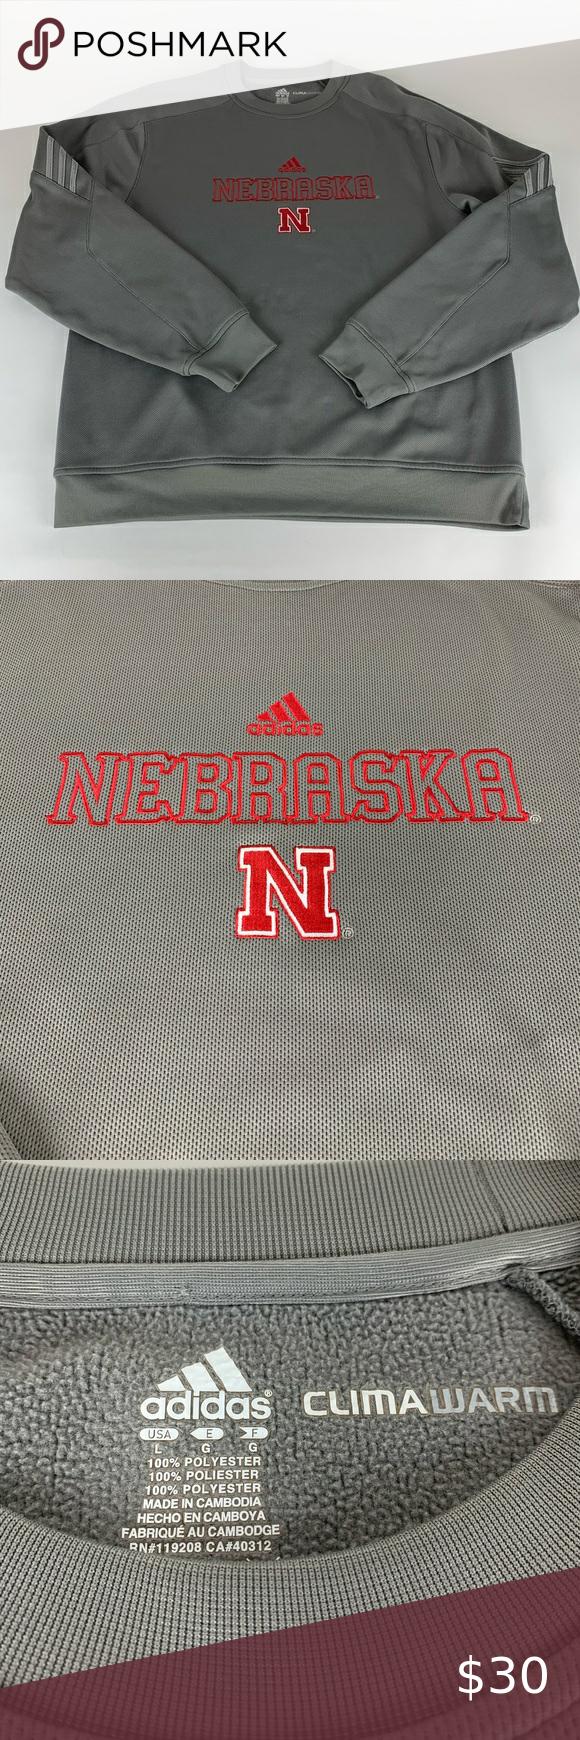 Nebraska Cornhuskers Adidas Climawarm Sweatshirt Nebraska Cornhuskers Sweatshirt Shirt Cornhuskers [ 1740 x 580 Pixel ]